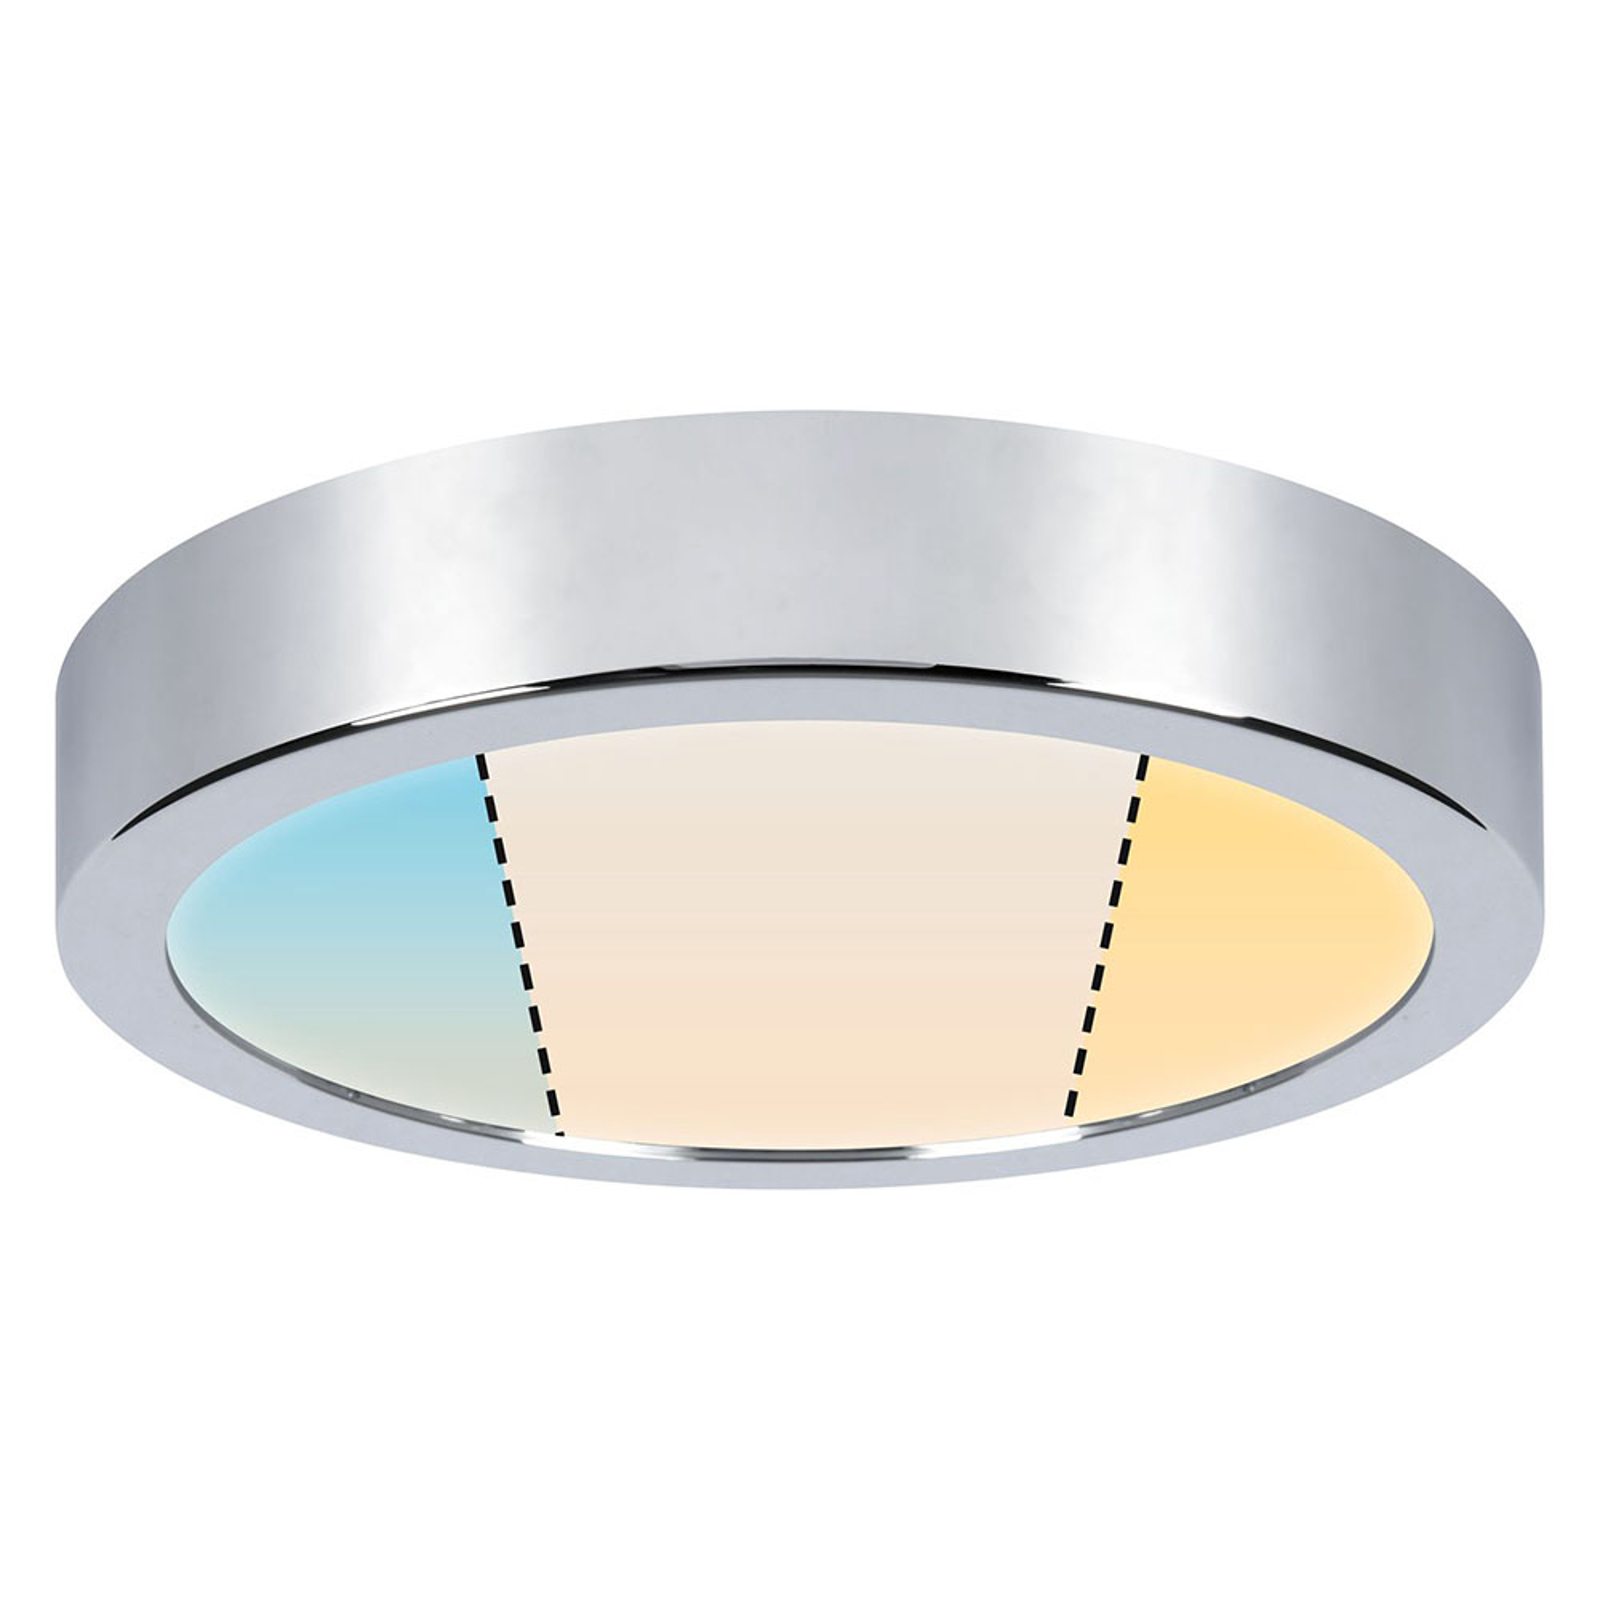 Dove acquistare Paulmann Aviar plafoniera LED WhiteSwitch Ø 22cm